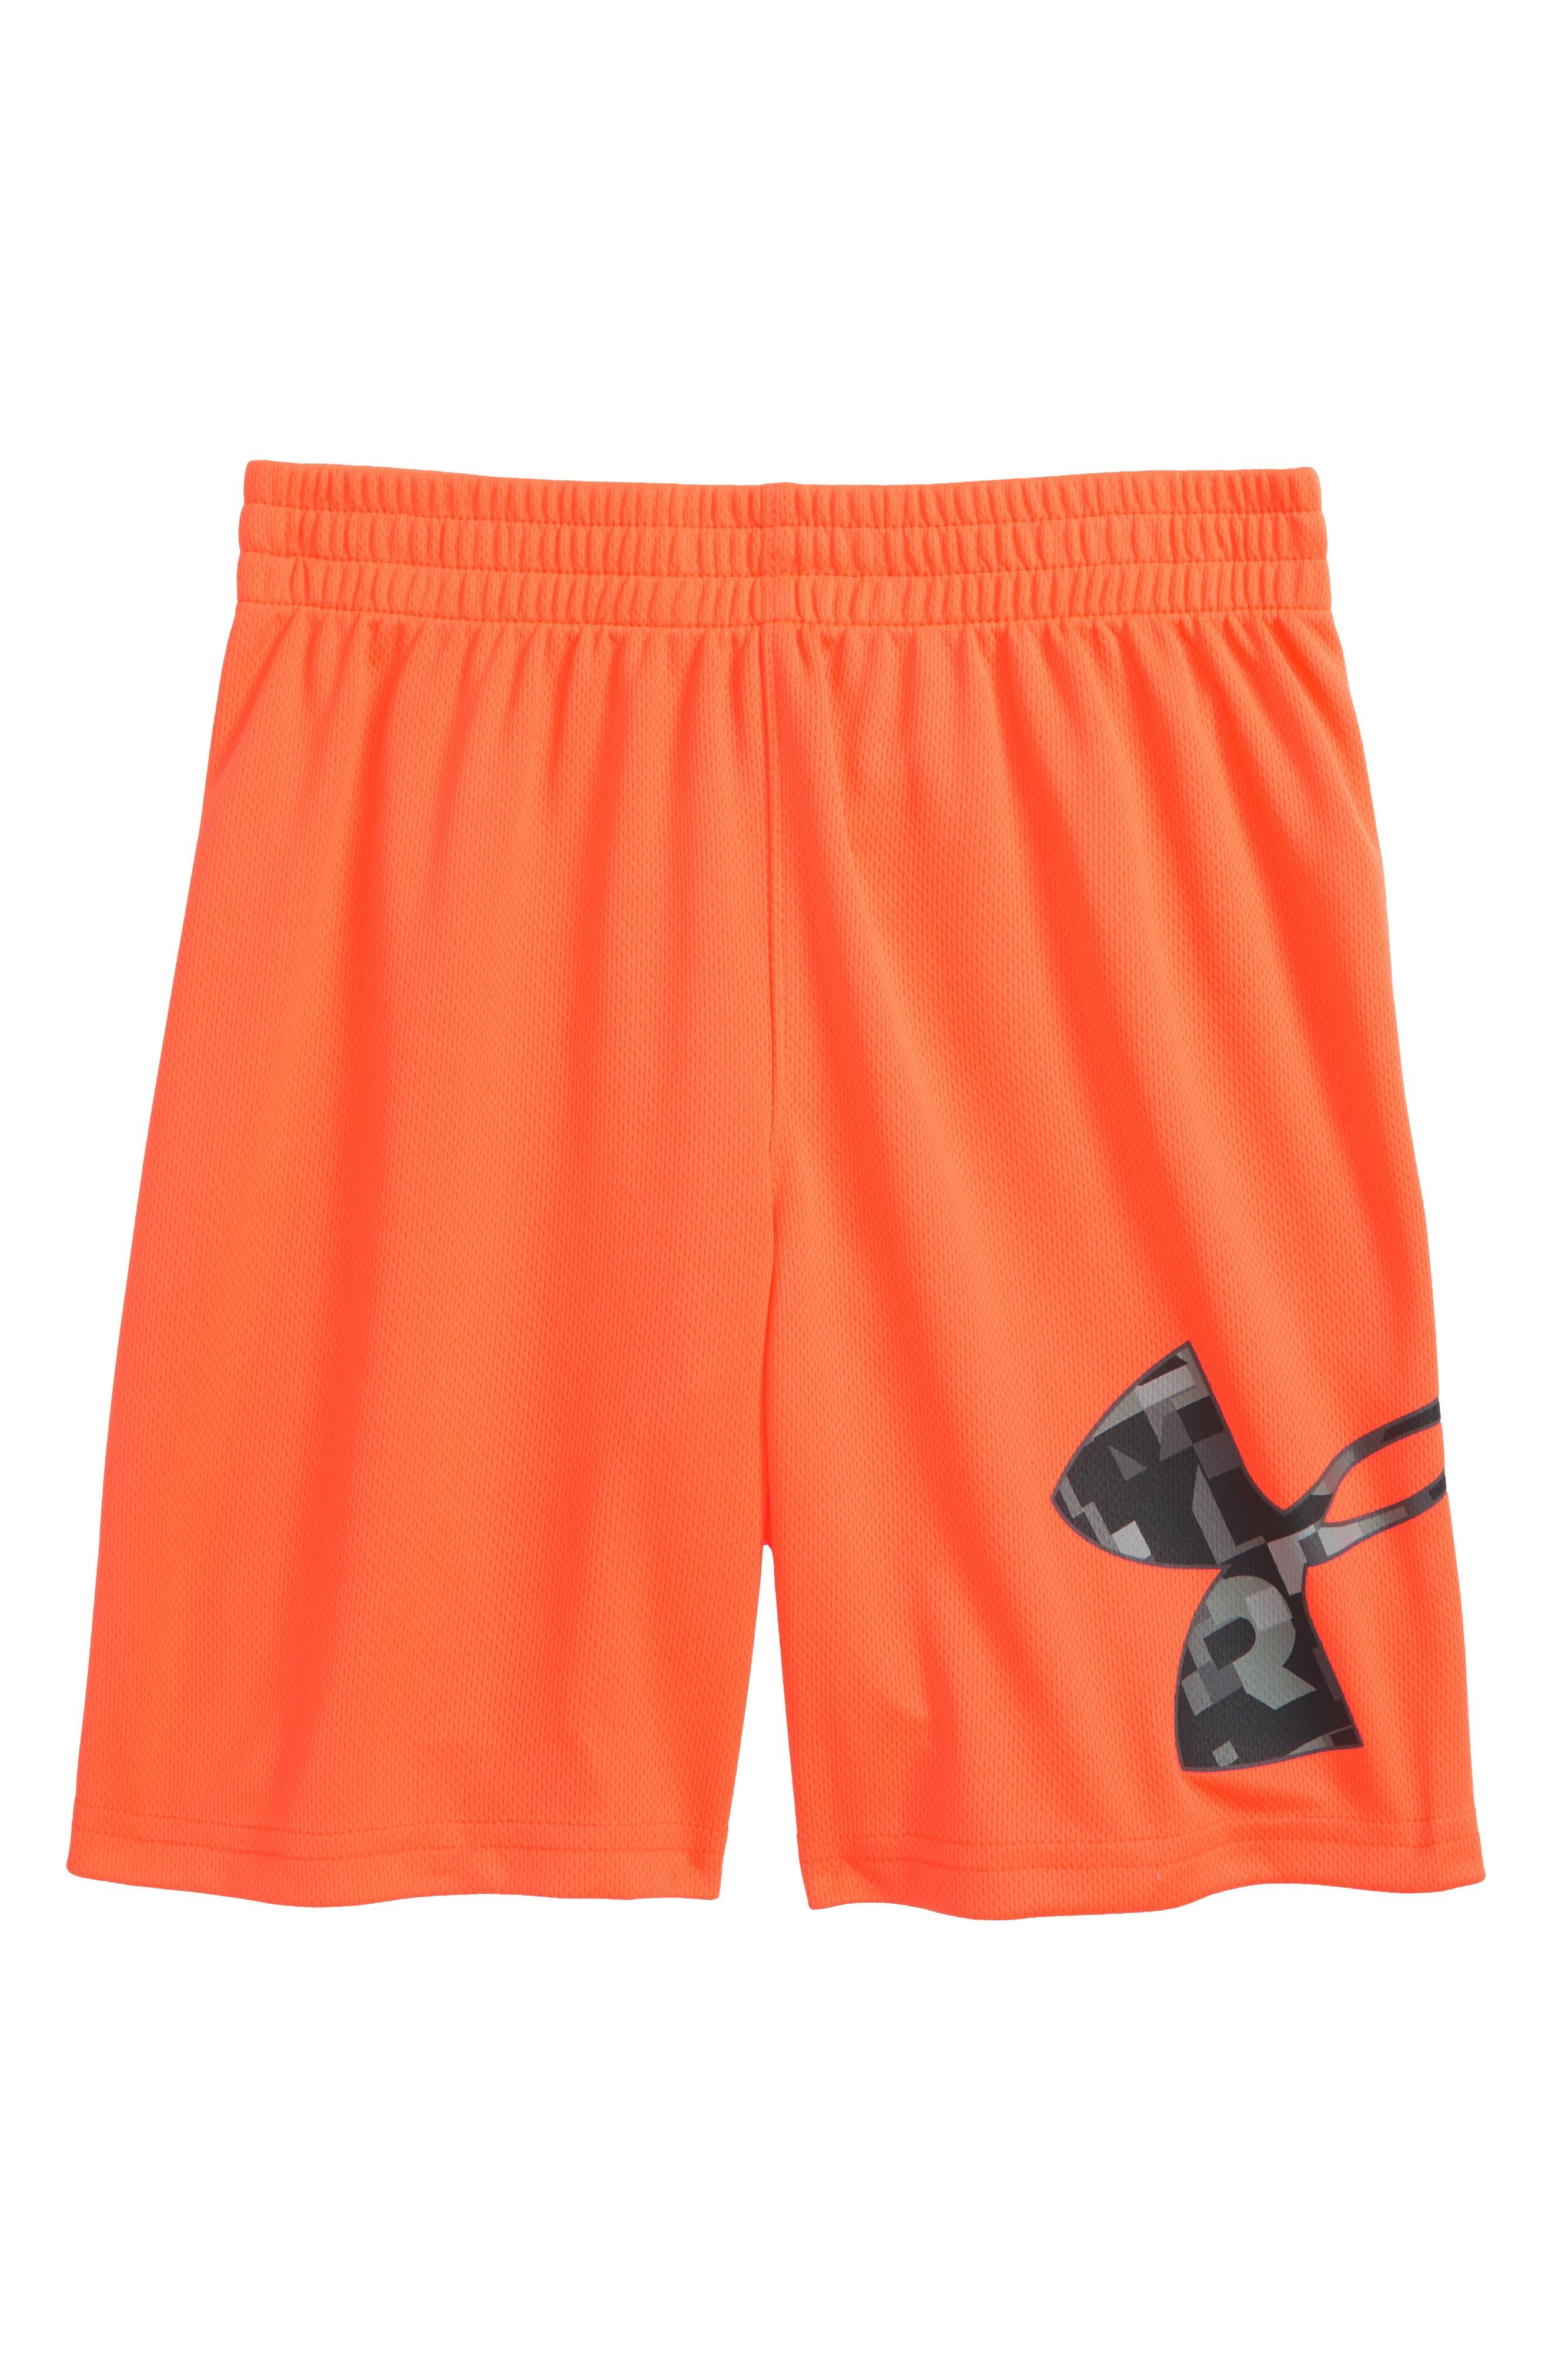 Under Armour Wordmark Striker HeatGear® Shorts (Toddler Boys & Little Boys)